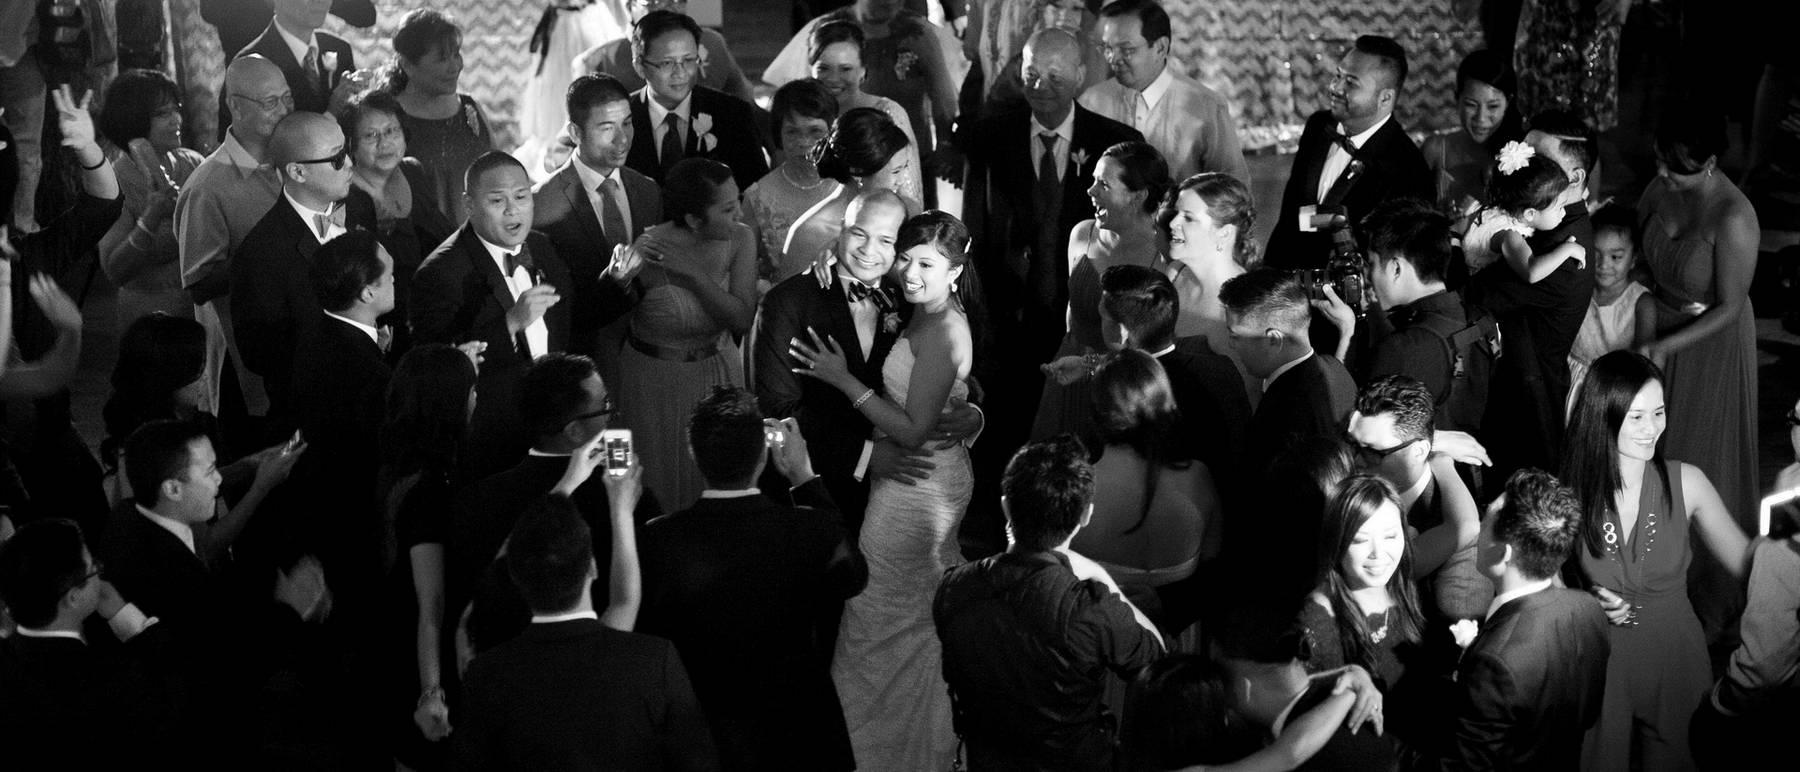 johnandjoseph-wedding-photographer-hz-slider-248